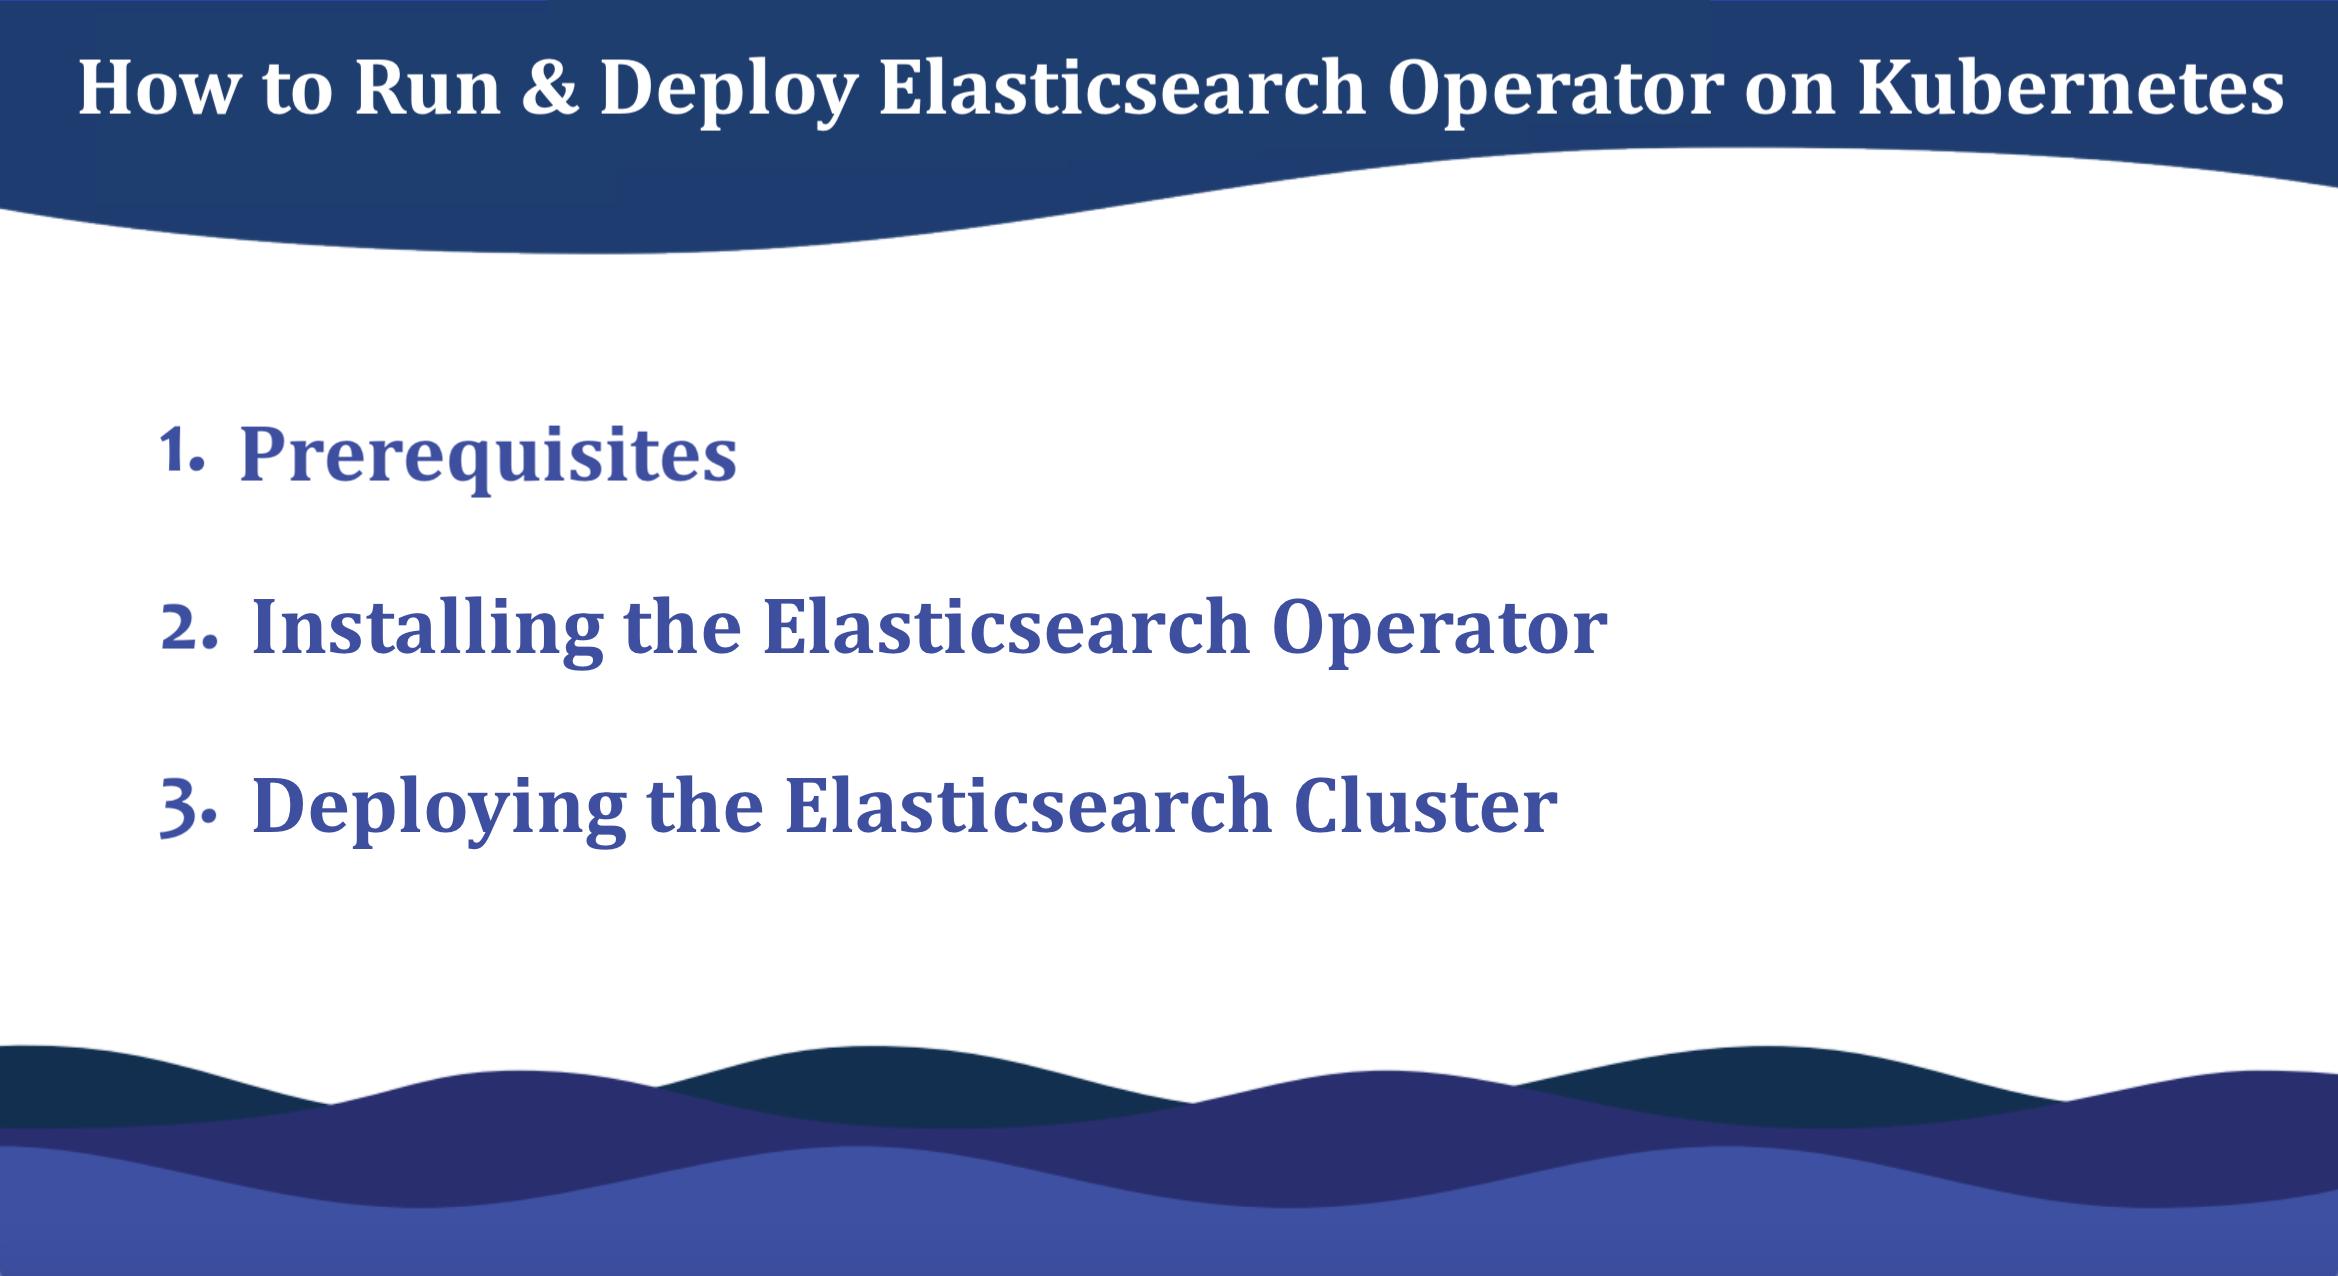 Run & deploy elasticsearch operator on klubernetes